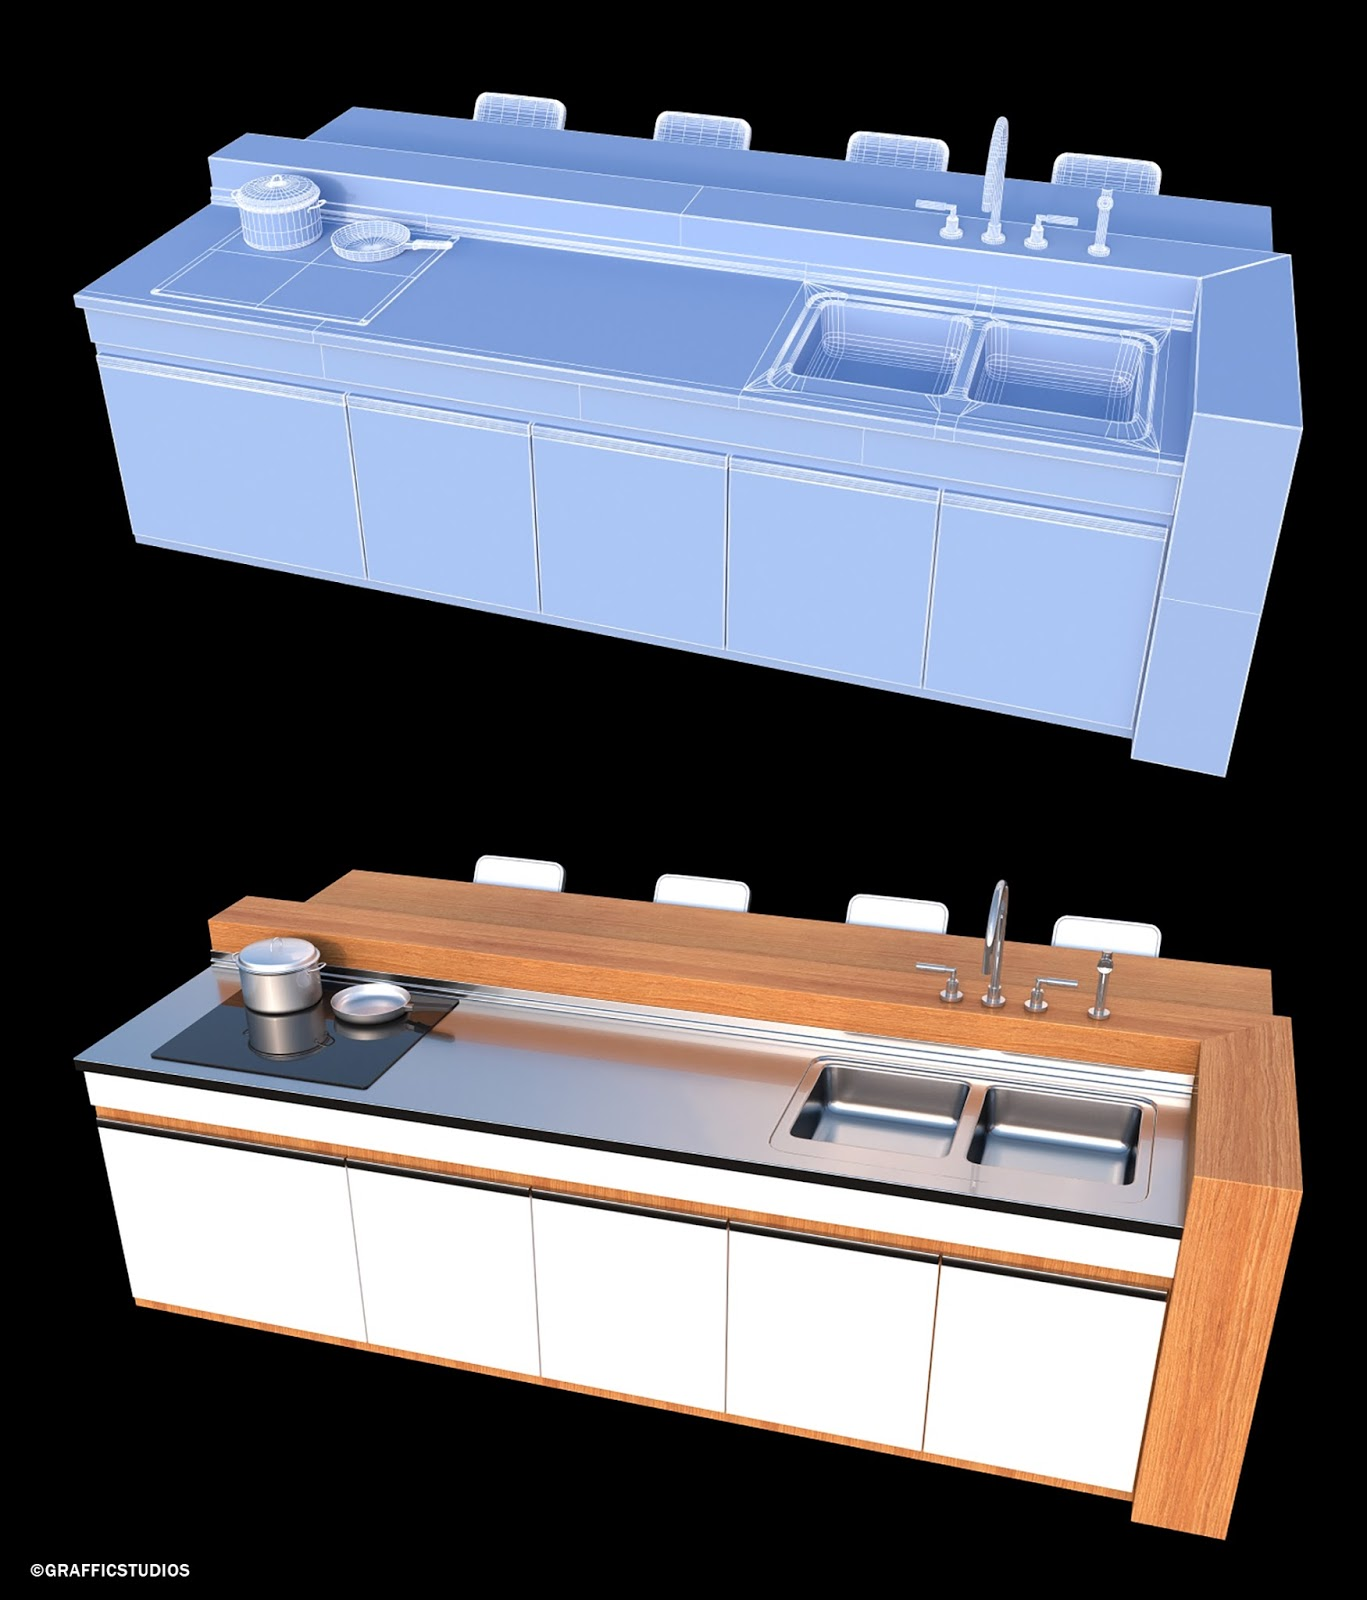 cuisine cr ation d 39 un lot central. Black Bedroom Furniture Sets. Home Design Ideas